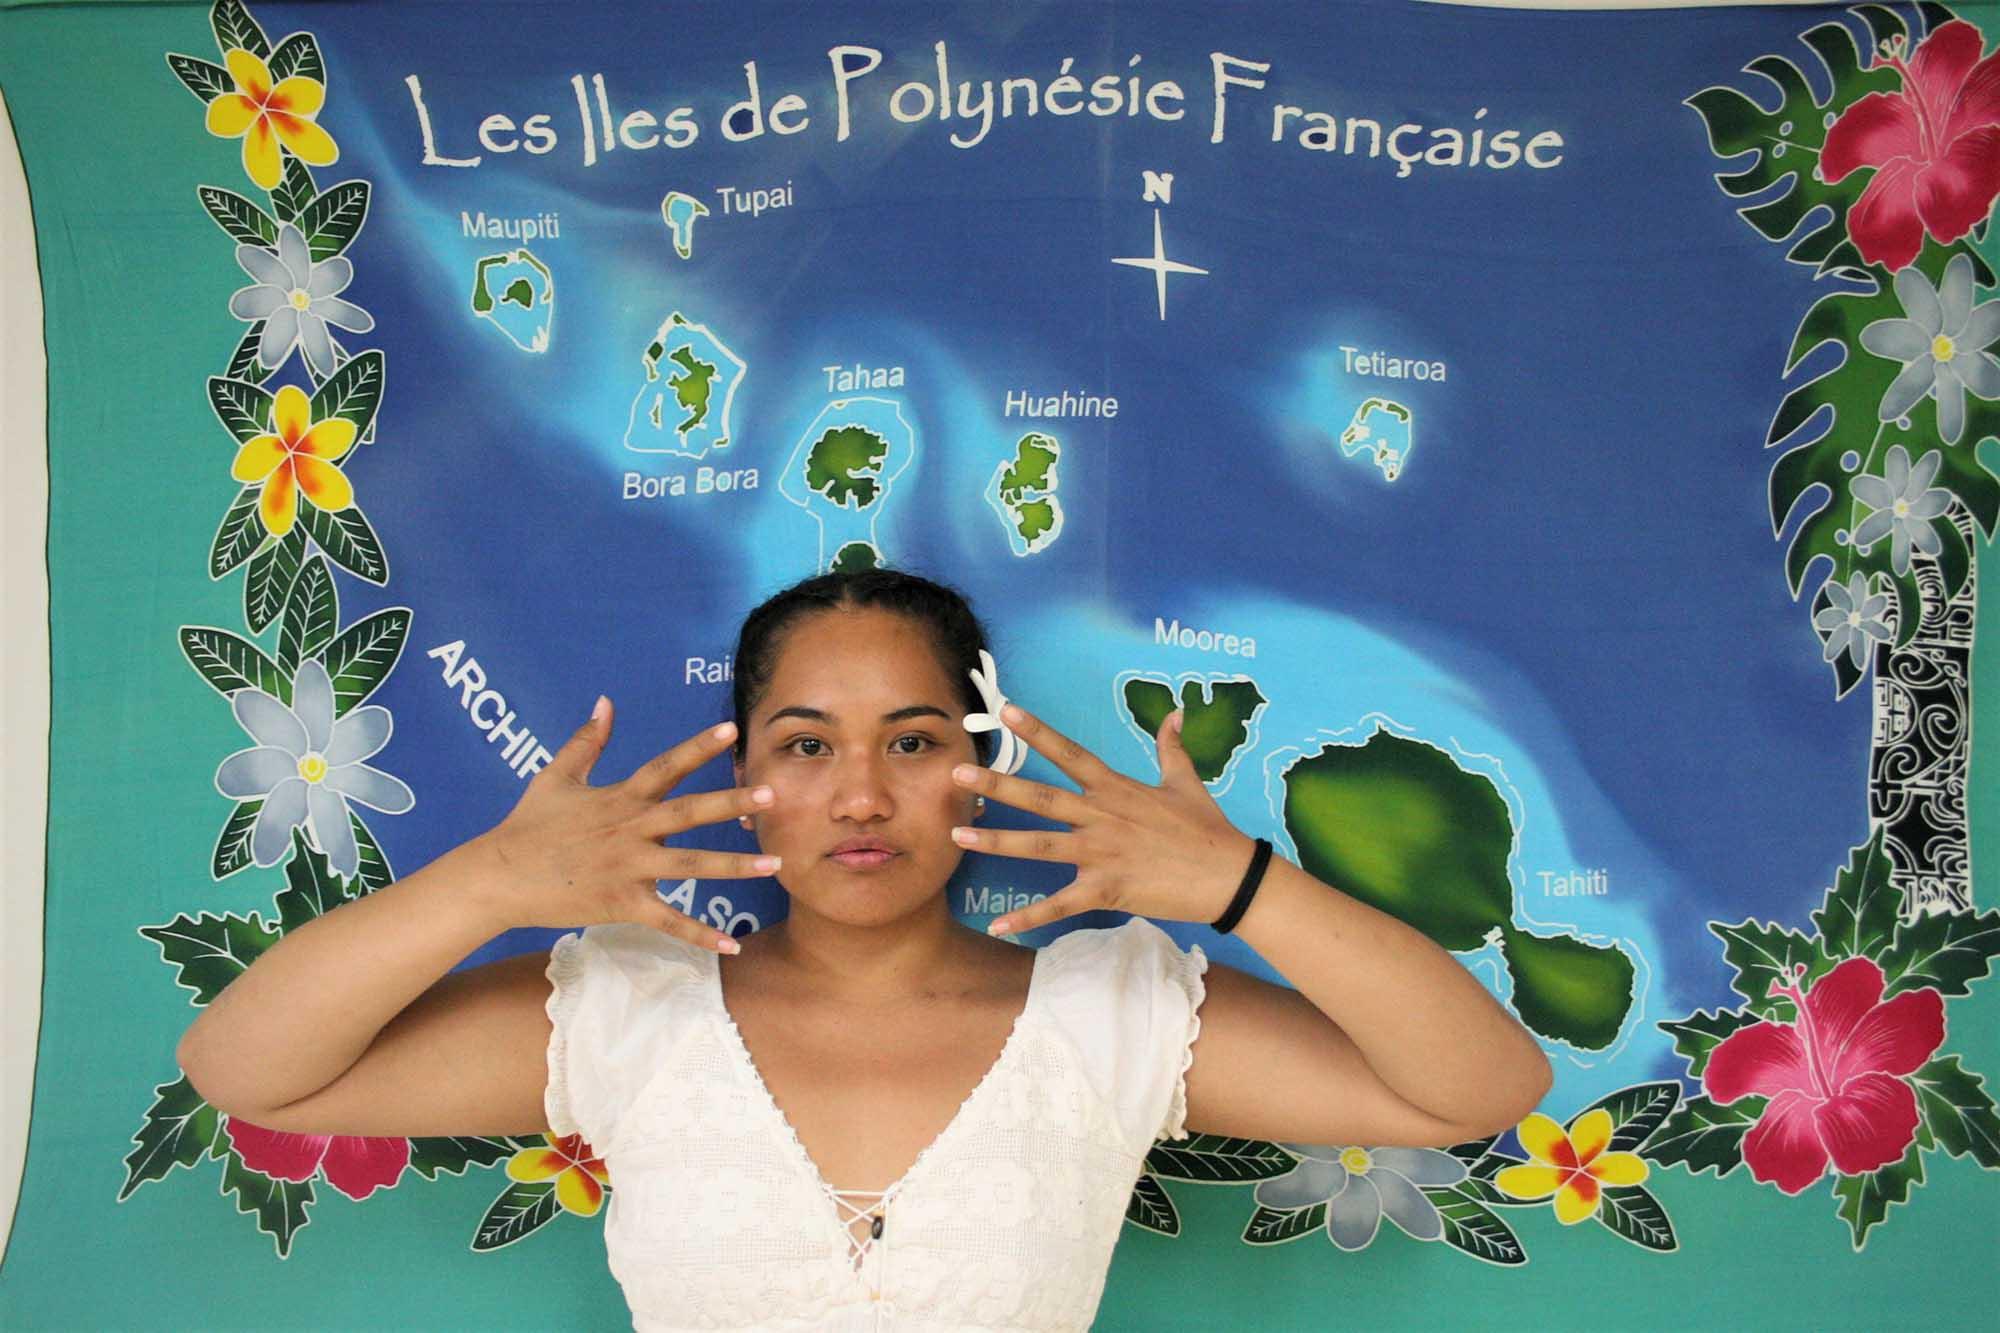 Danzas Polinesias